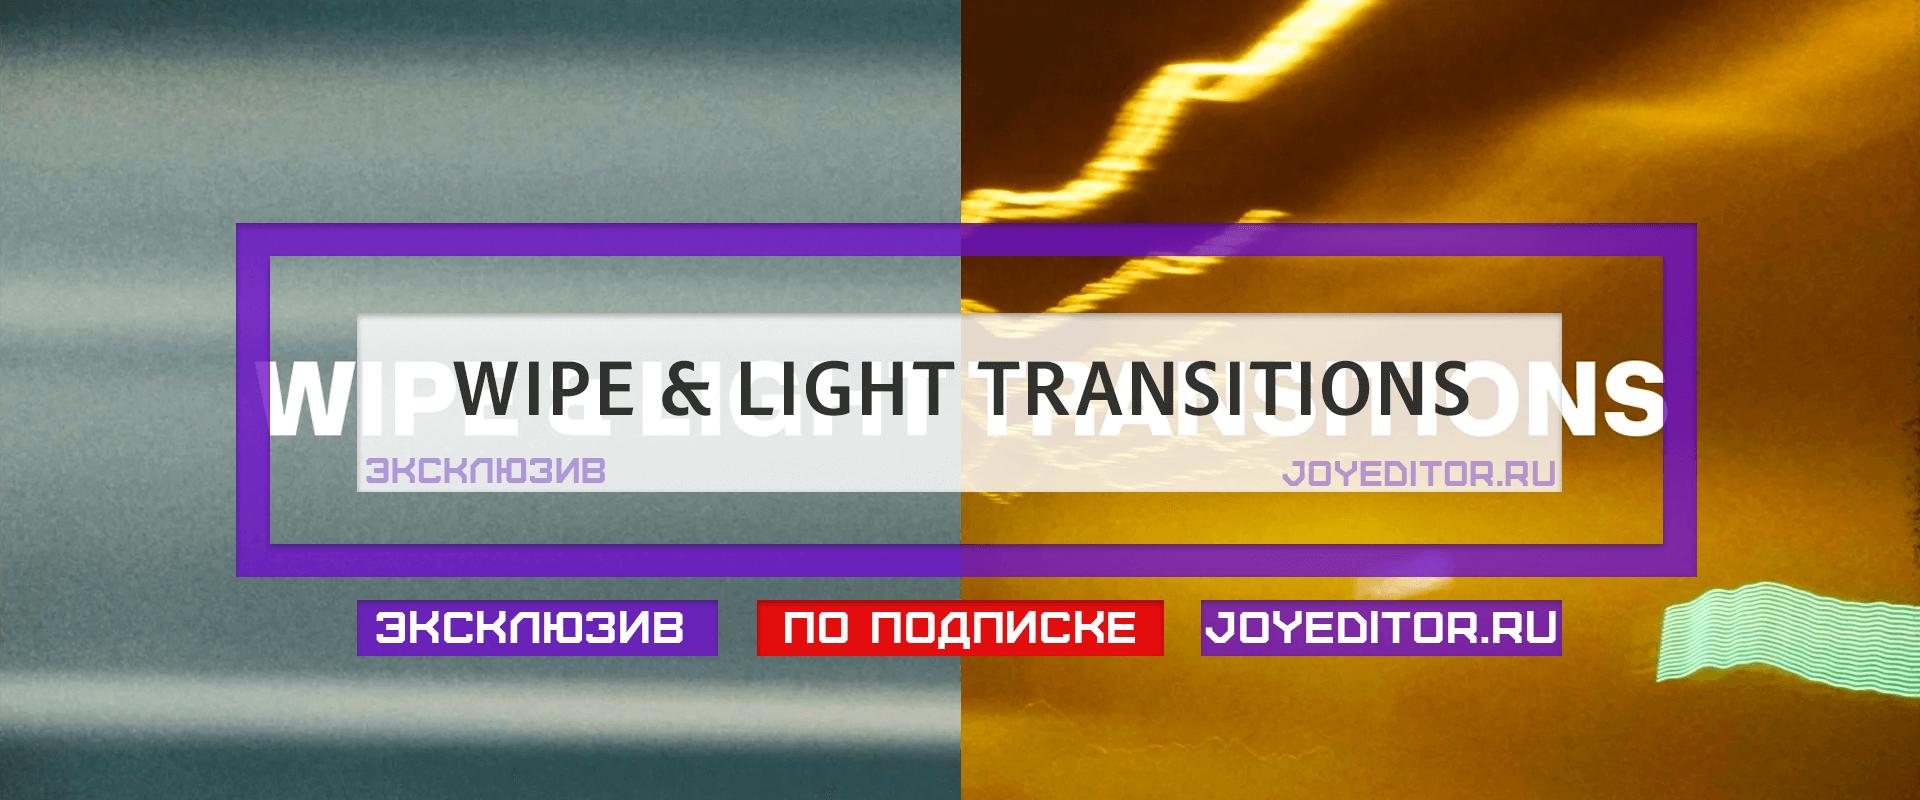 WIPE & LIGHT TRANSITIONS